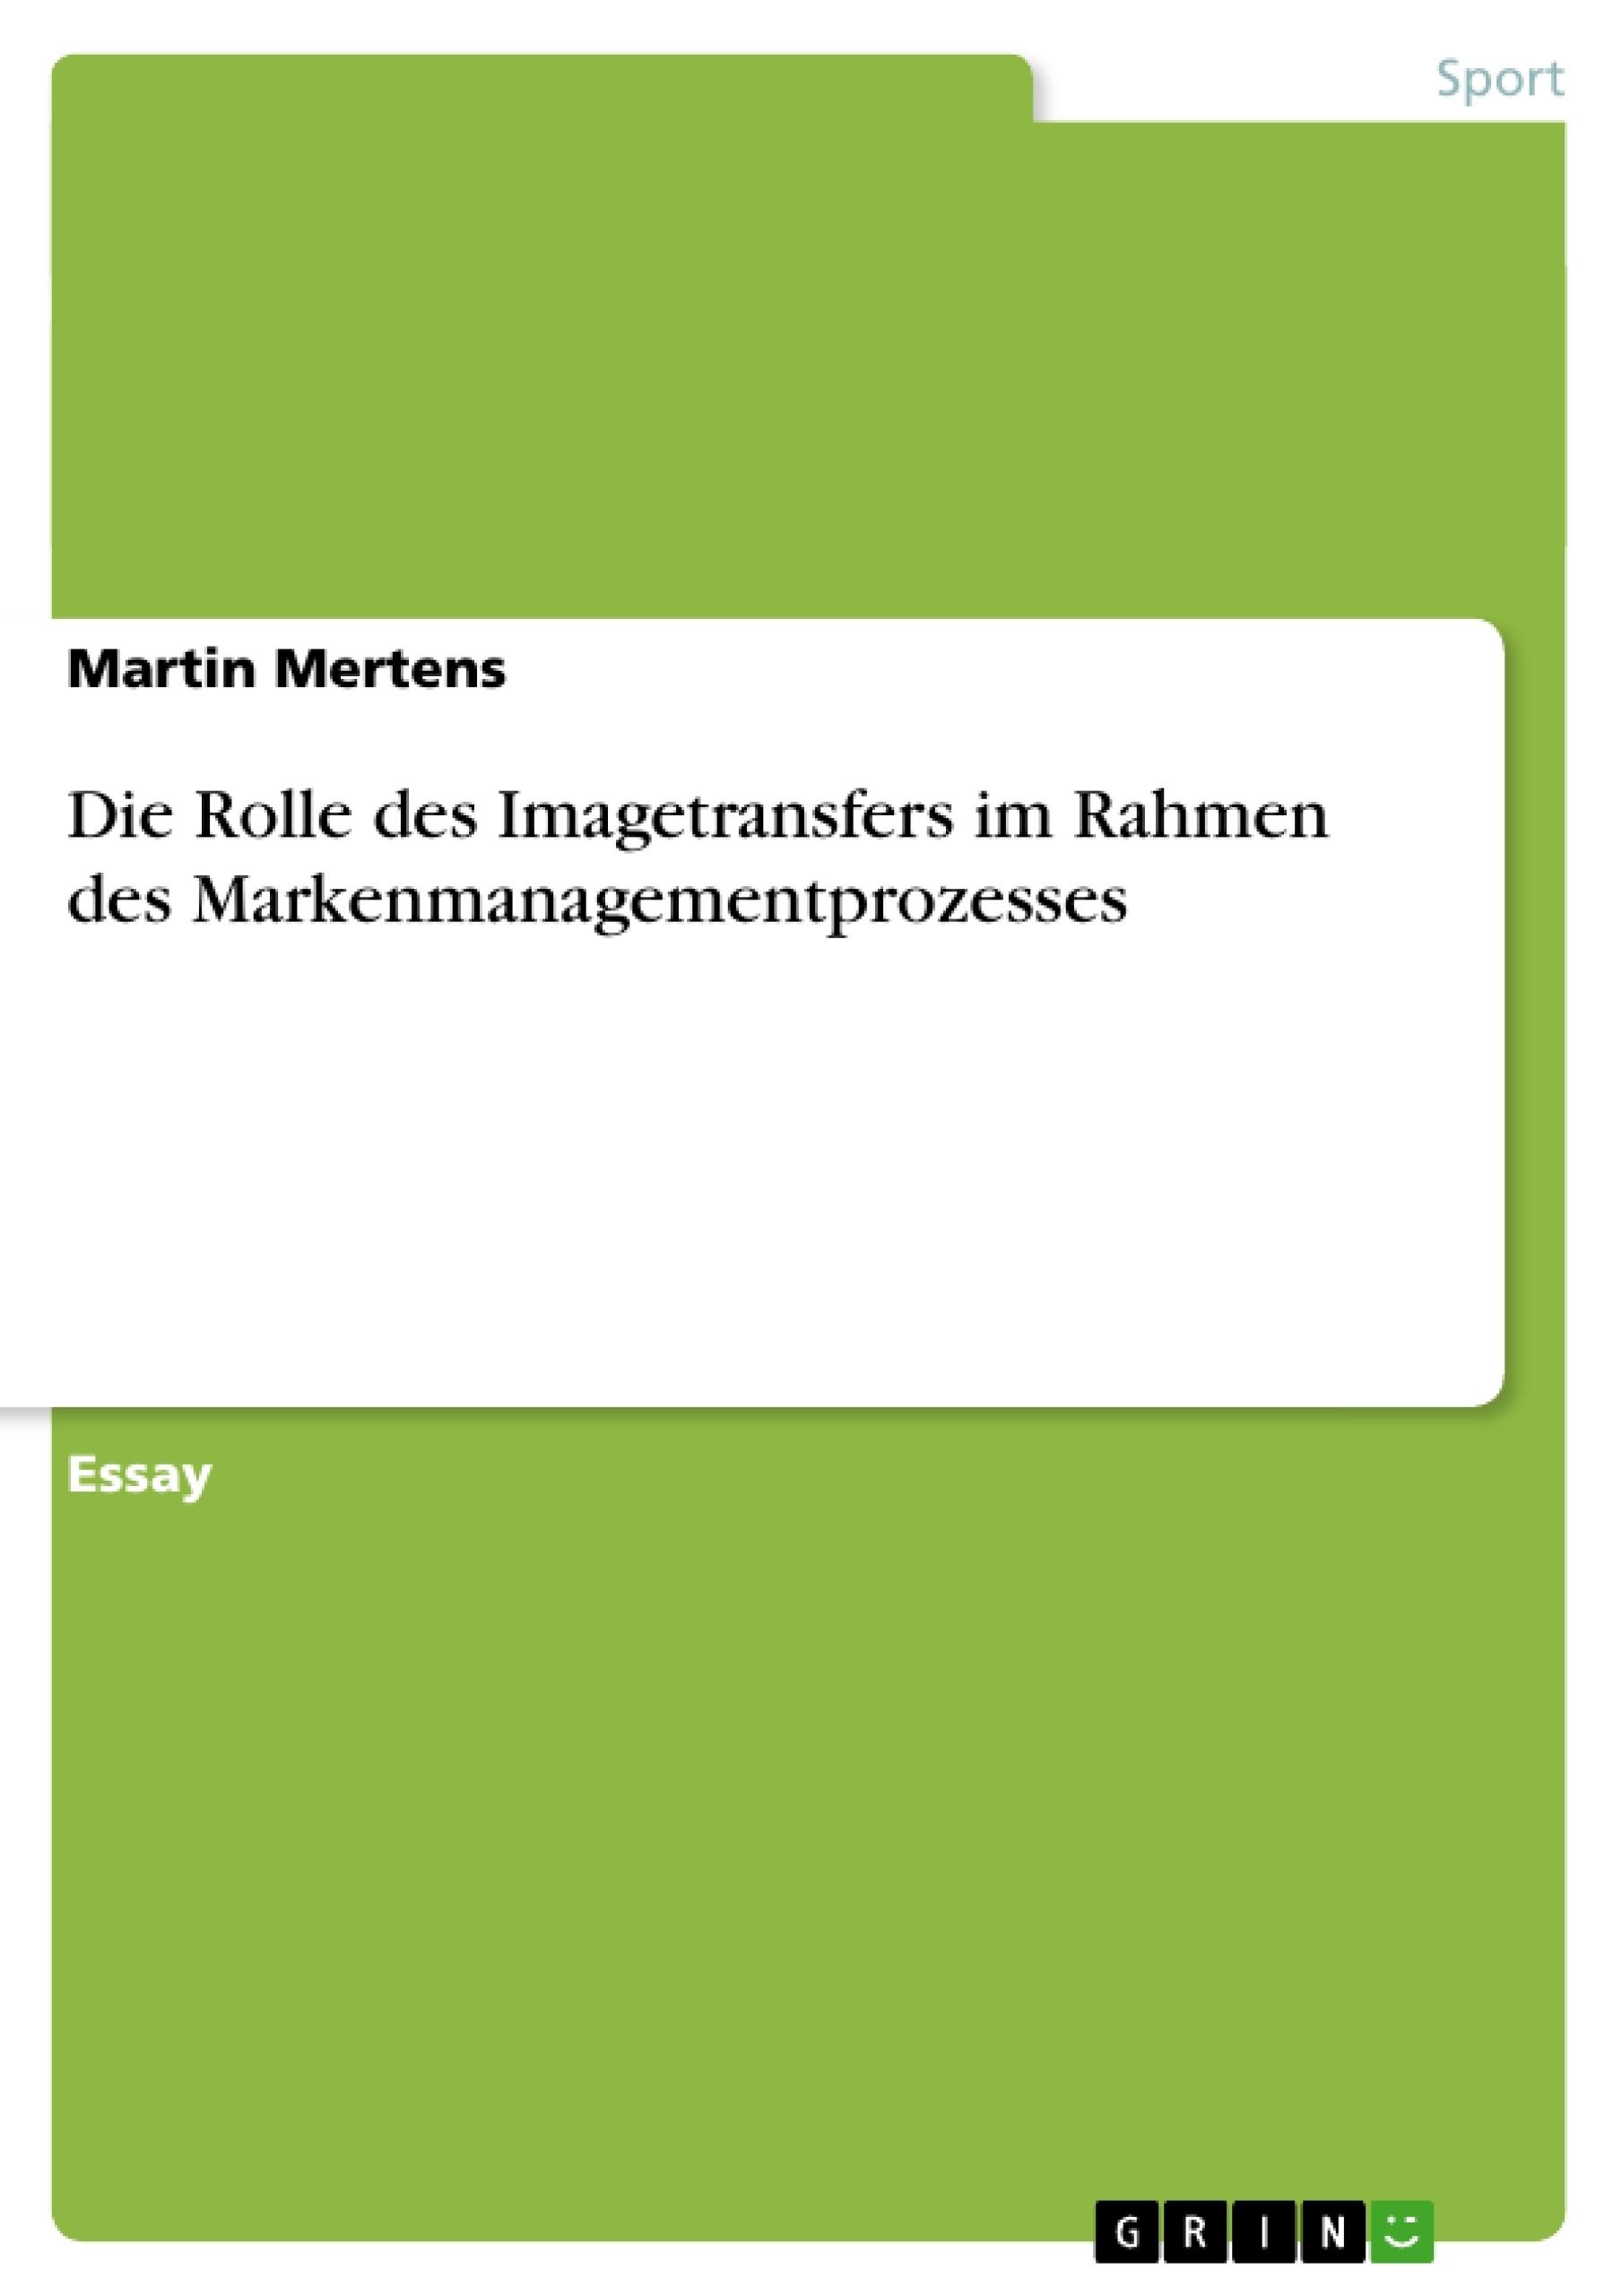 Die Rolle des Imagetransfers im Rahmen des Markenmanagementprozesses ...